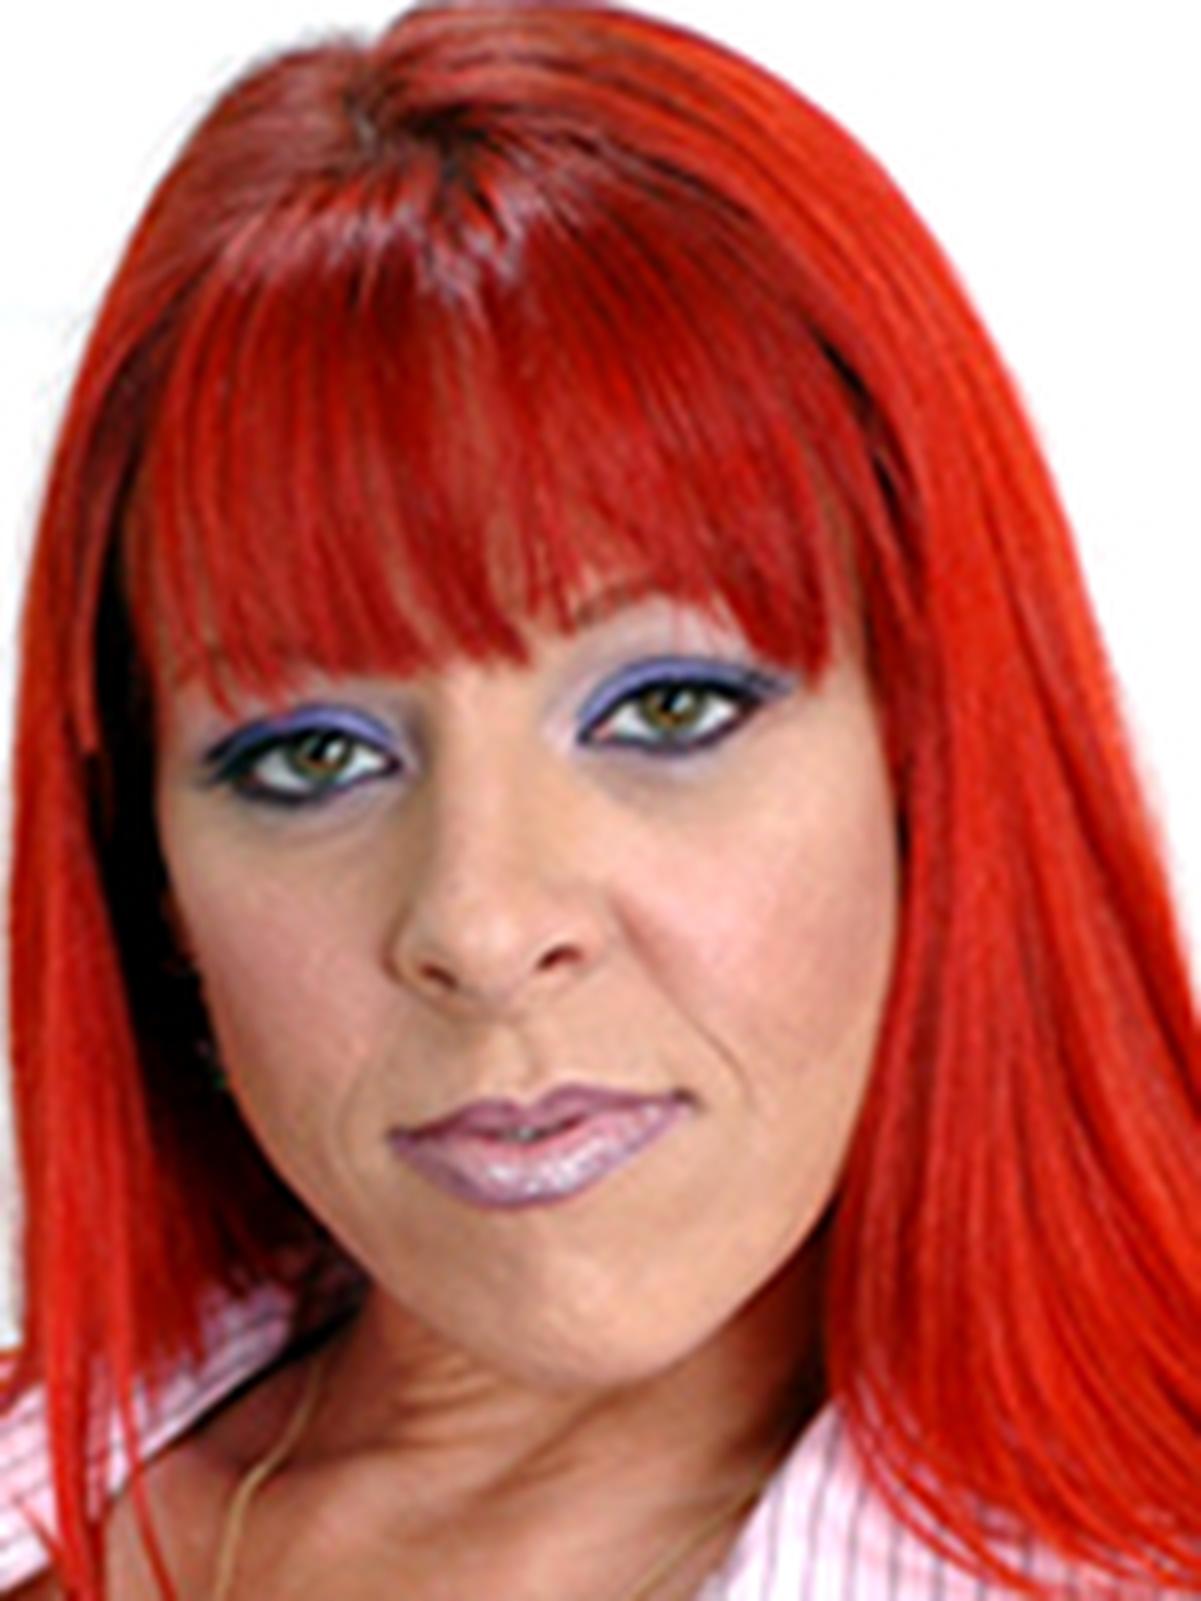 Whitney wonders evanston illinois 7